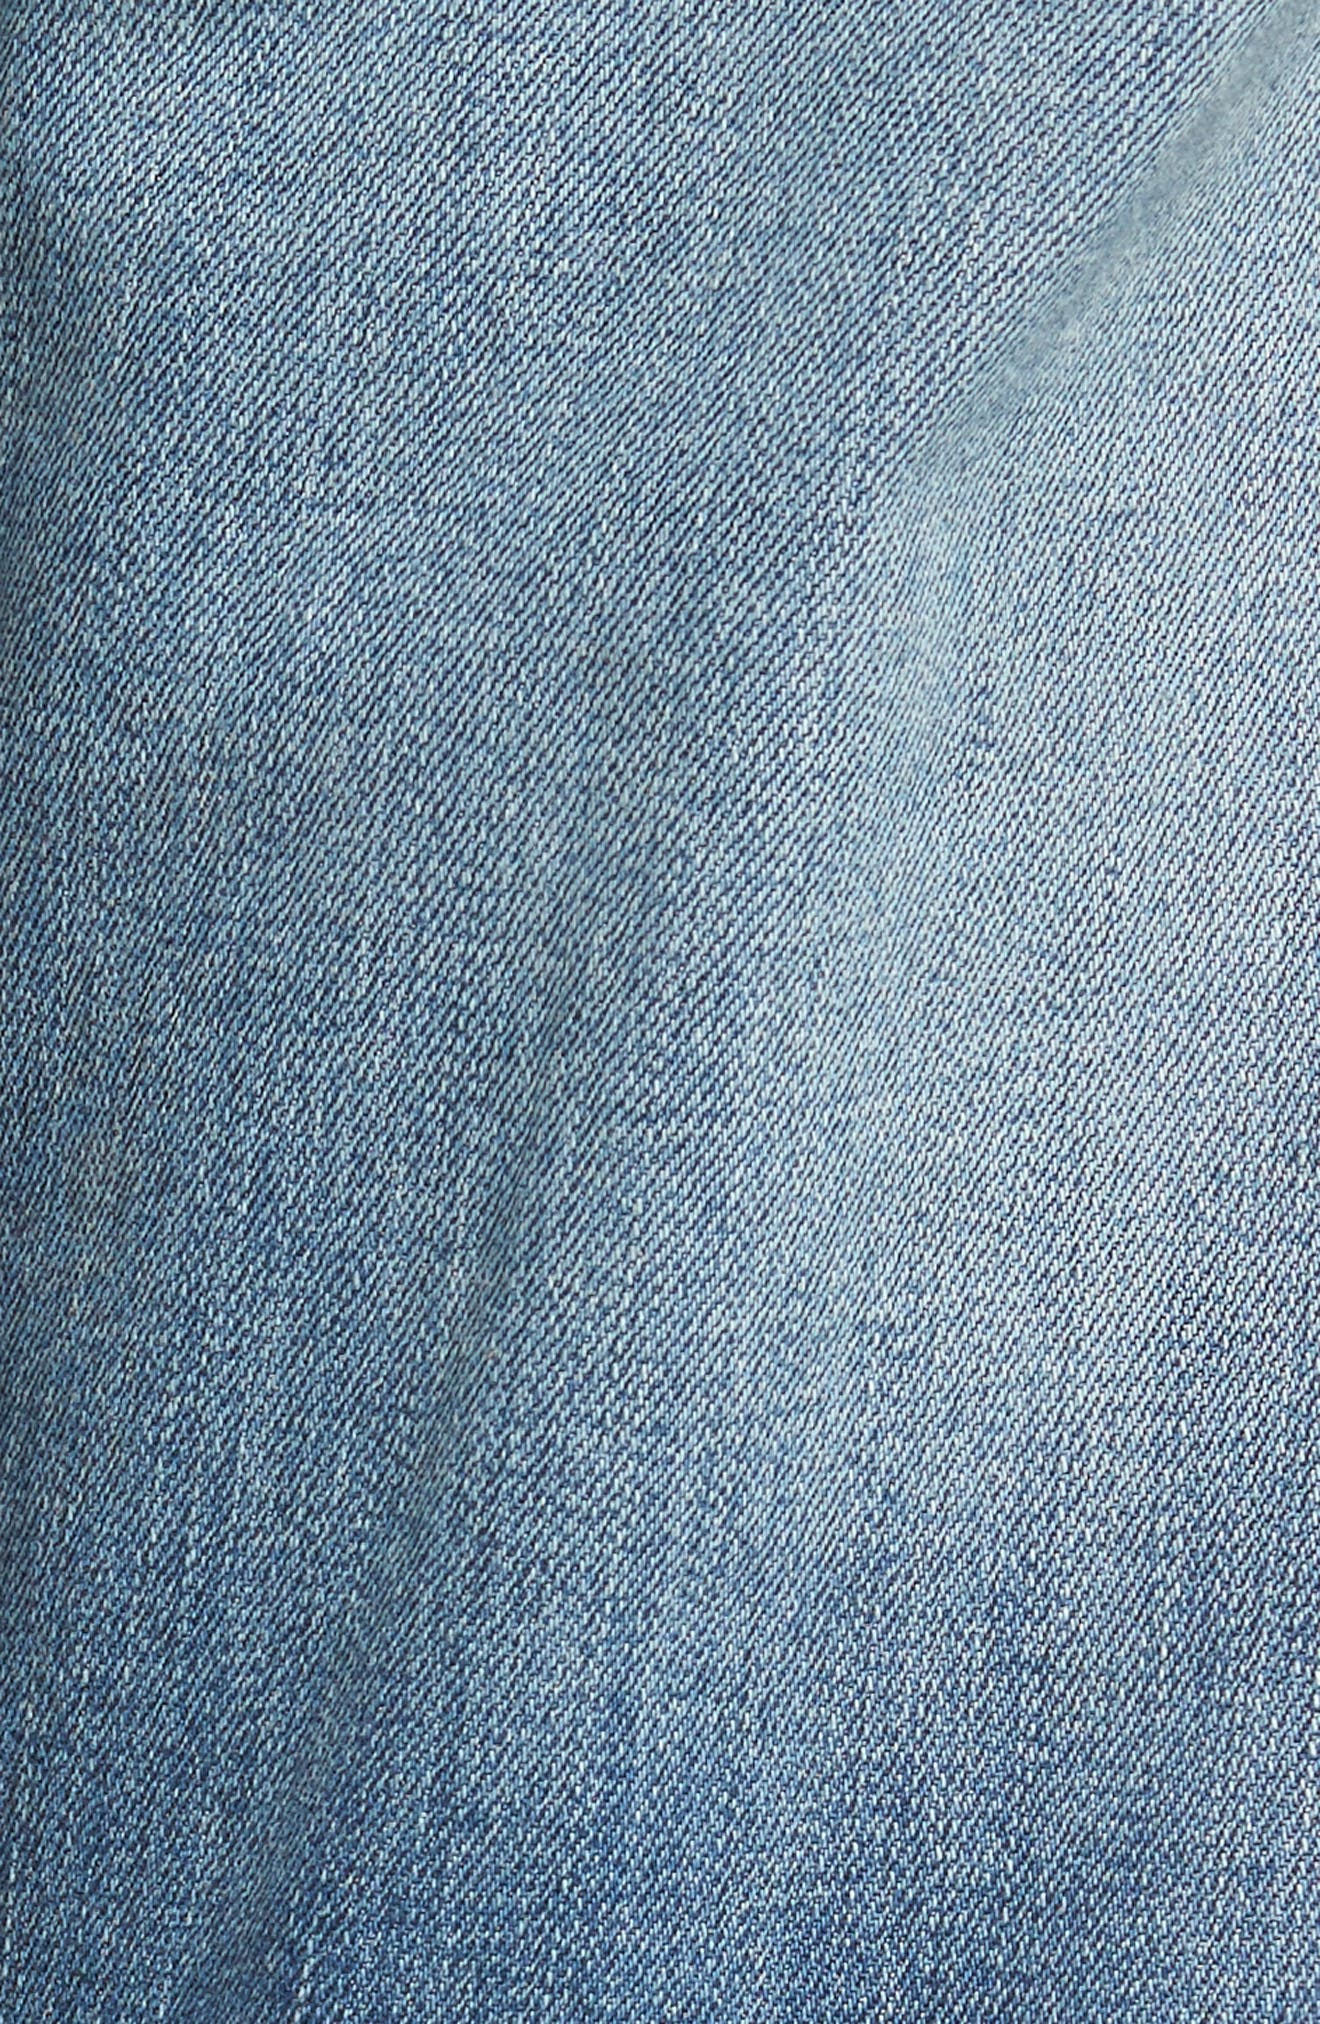 Alternate Image 5  - Joe's Slim Fit Jeans (Jayson)